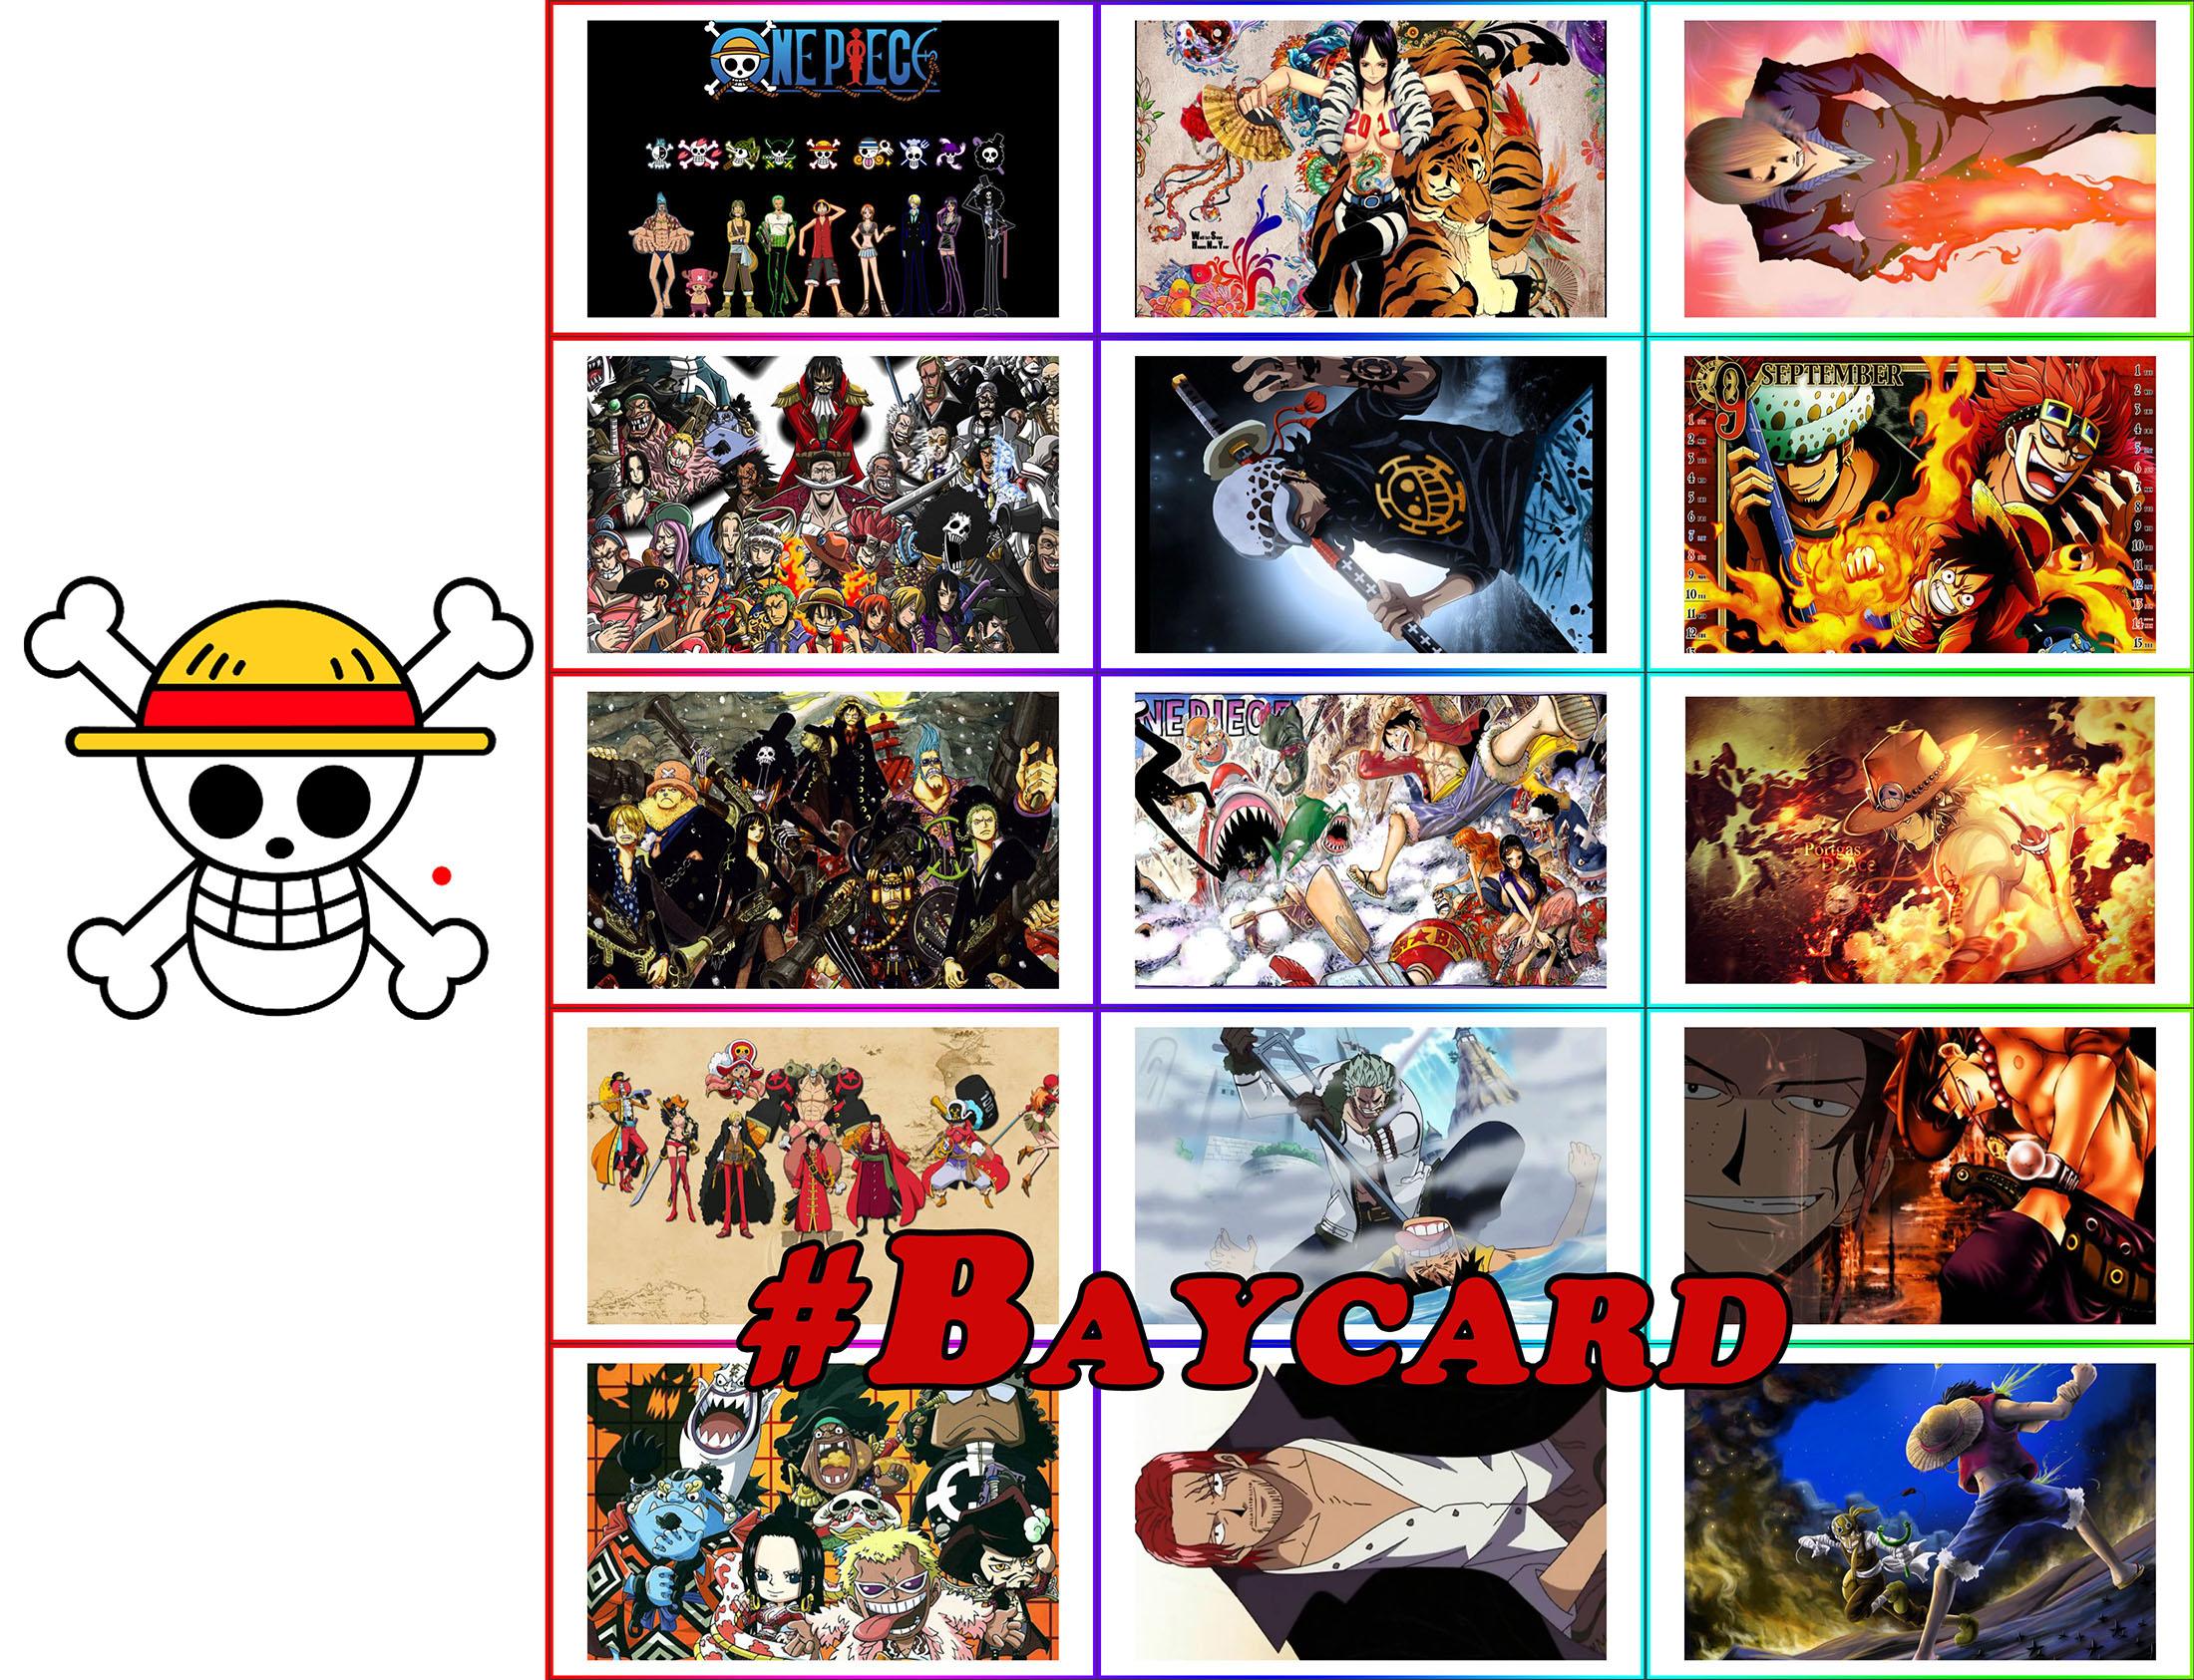 Baycard One piece đa dạng